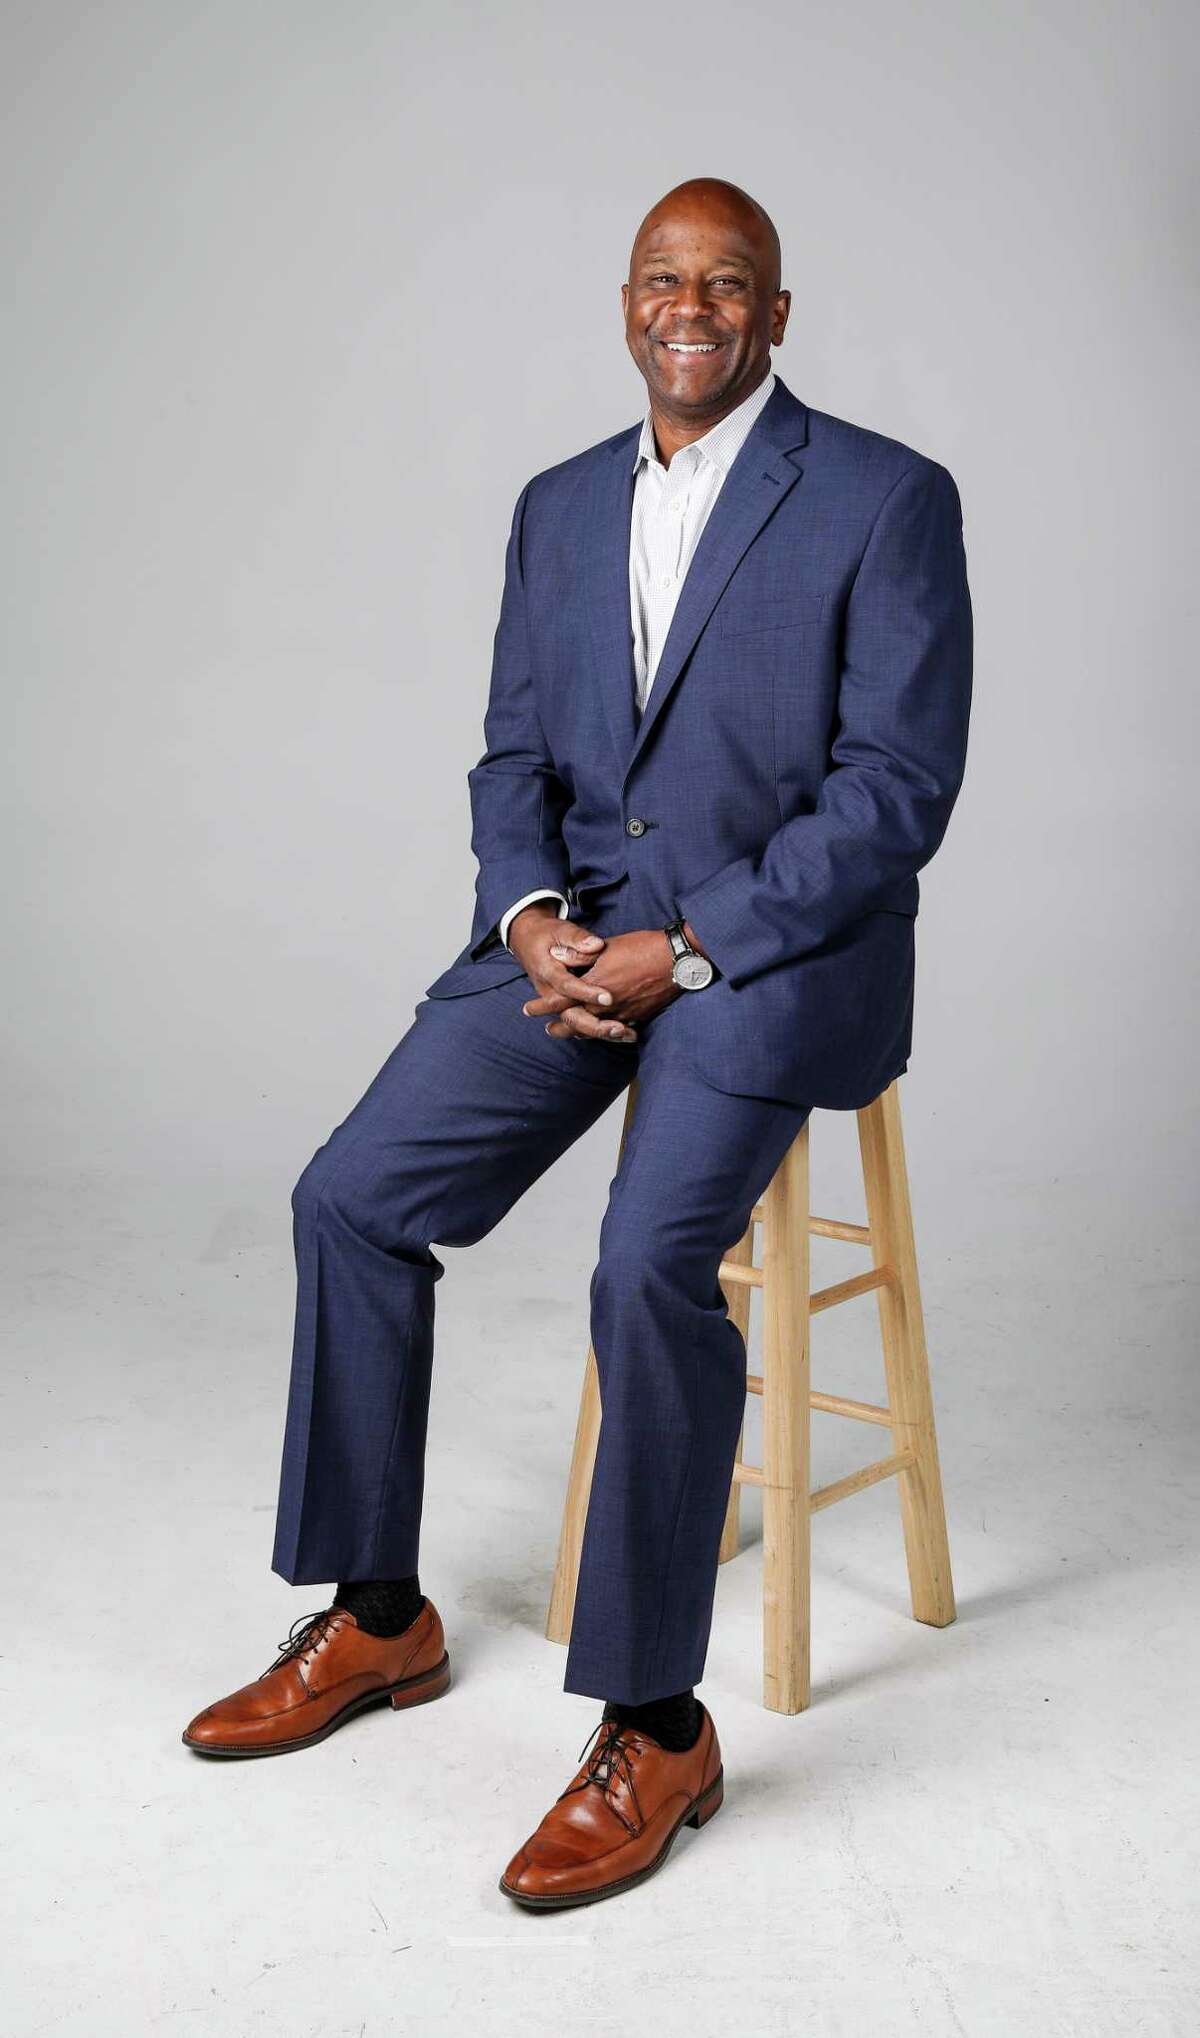 James Miller, division president of Empire Communities, poses for a portrait at the Houston Chronicle studio, Thursday, Oct. 26, 2017, in Houston. ( Jon Shapley / Houston Chronicle )